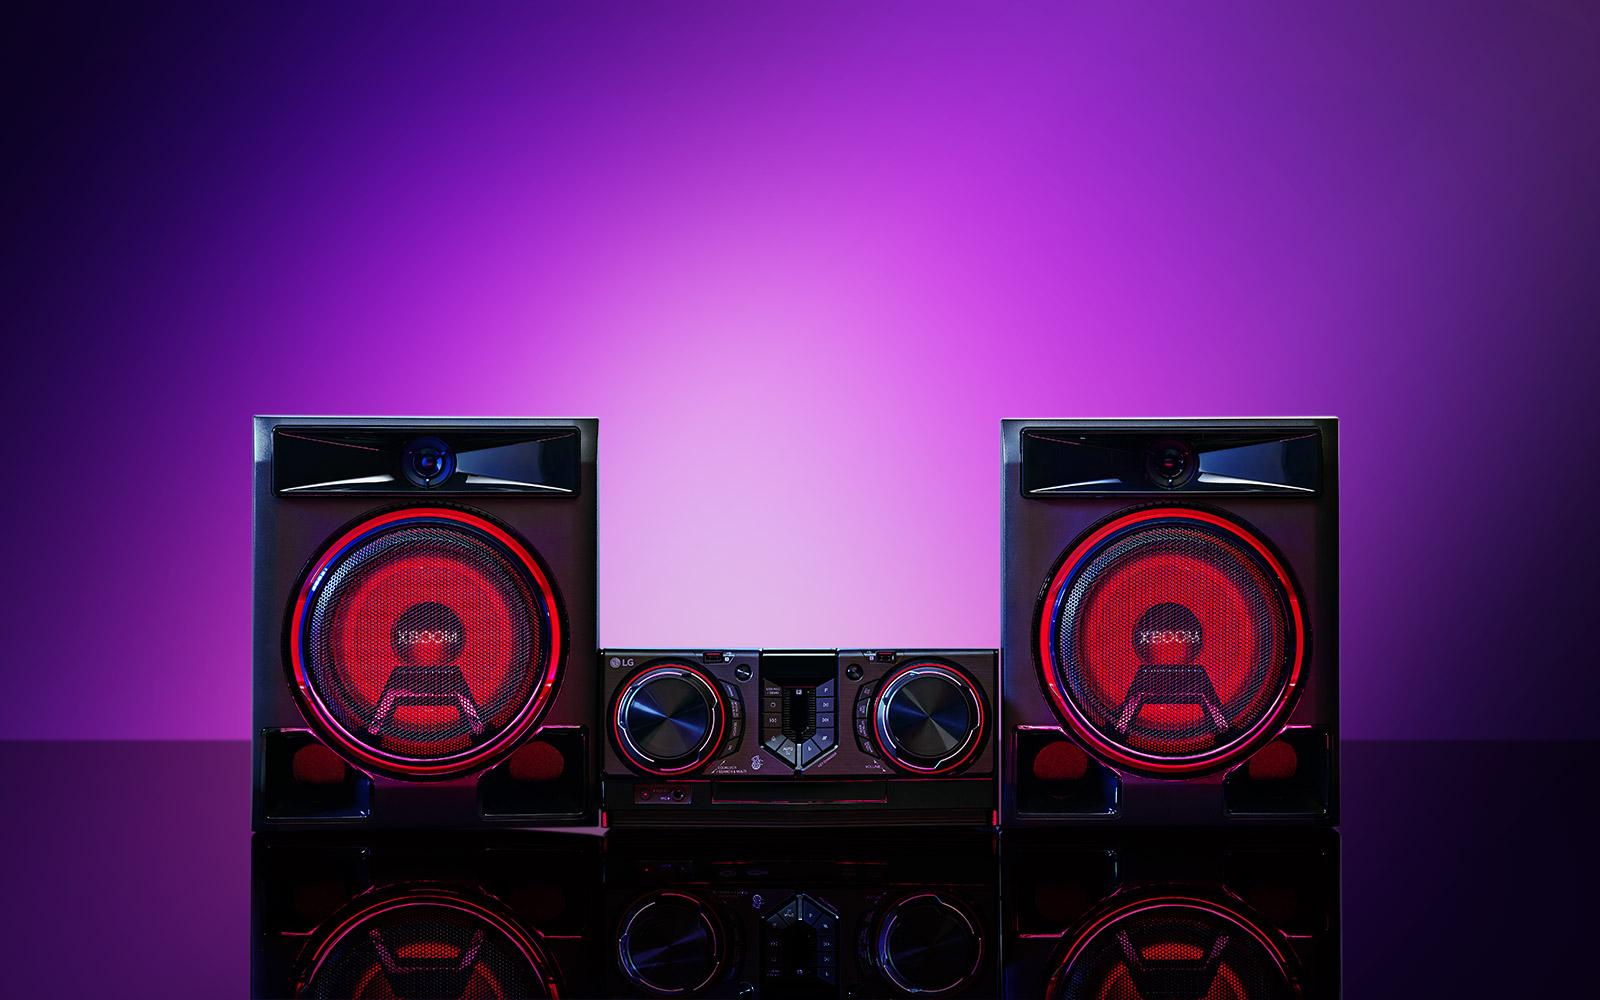 Powerful 950-Watt Sound<br>1